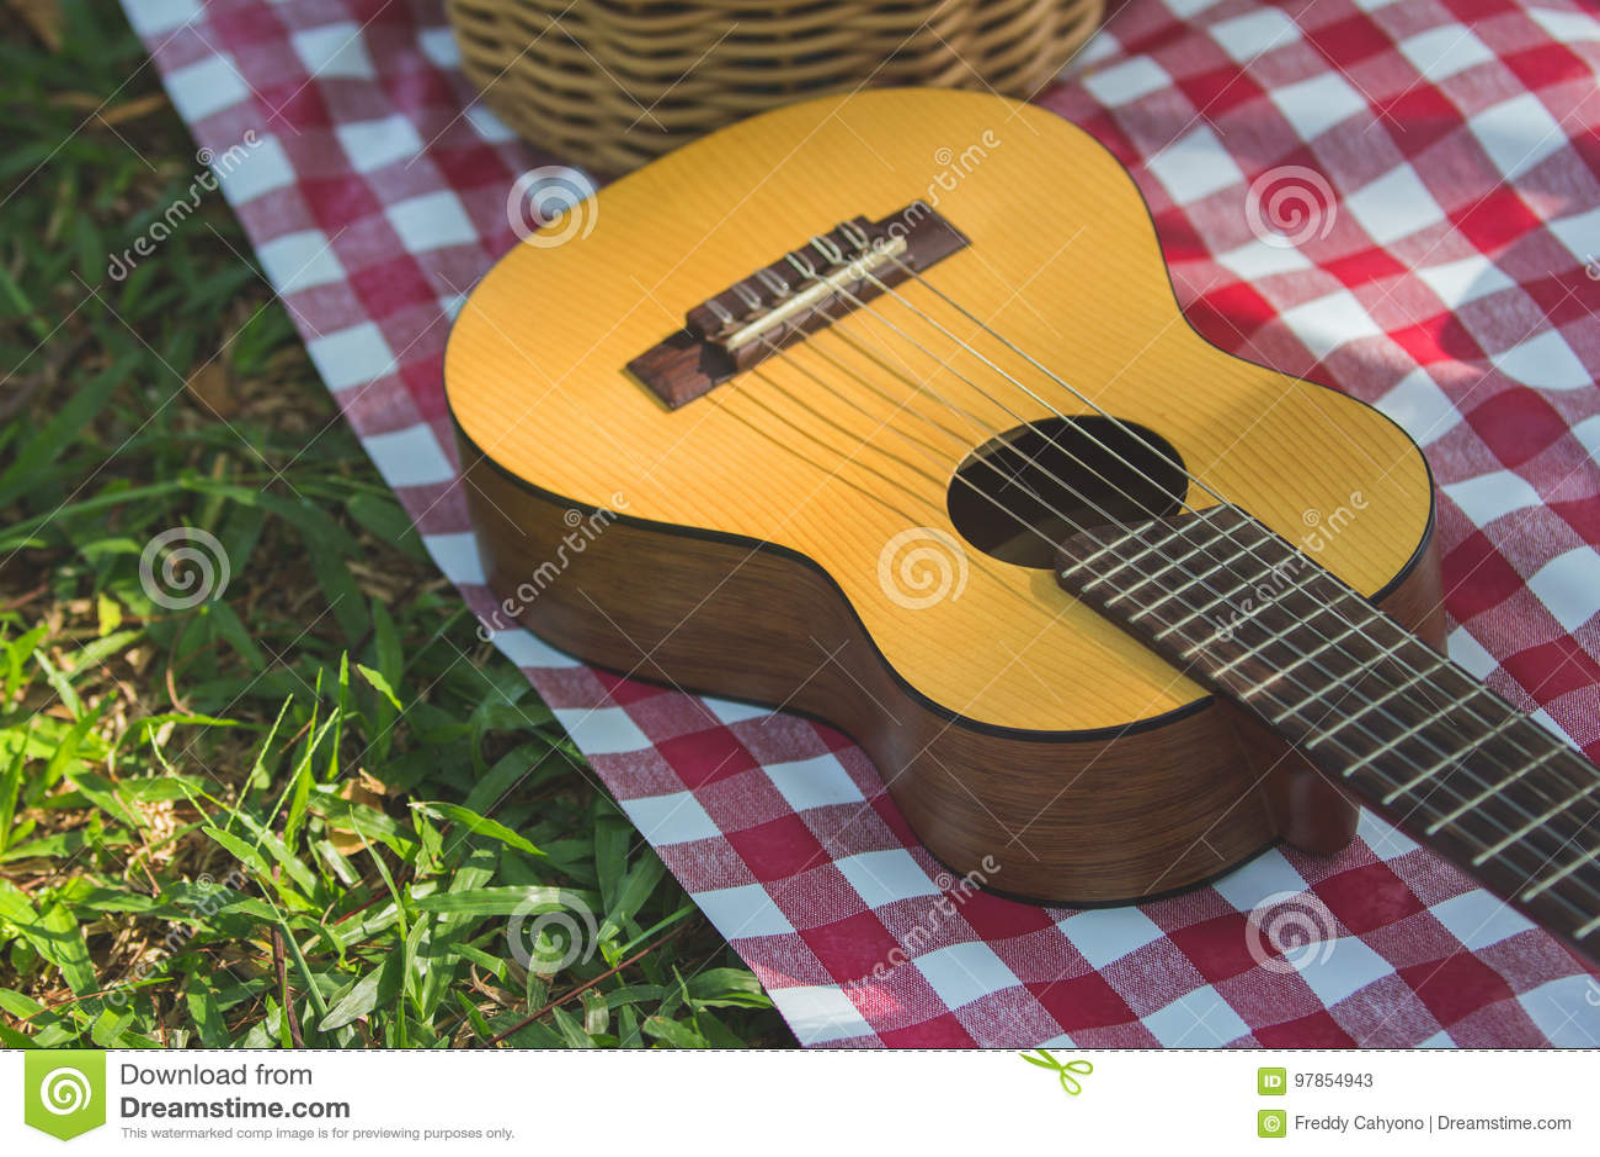 Picknickgitarre im Freien